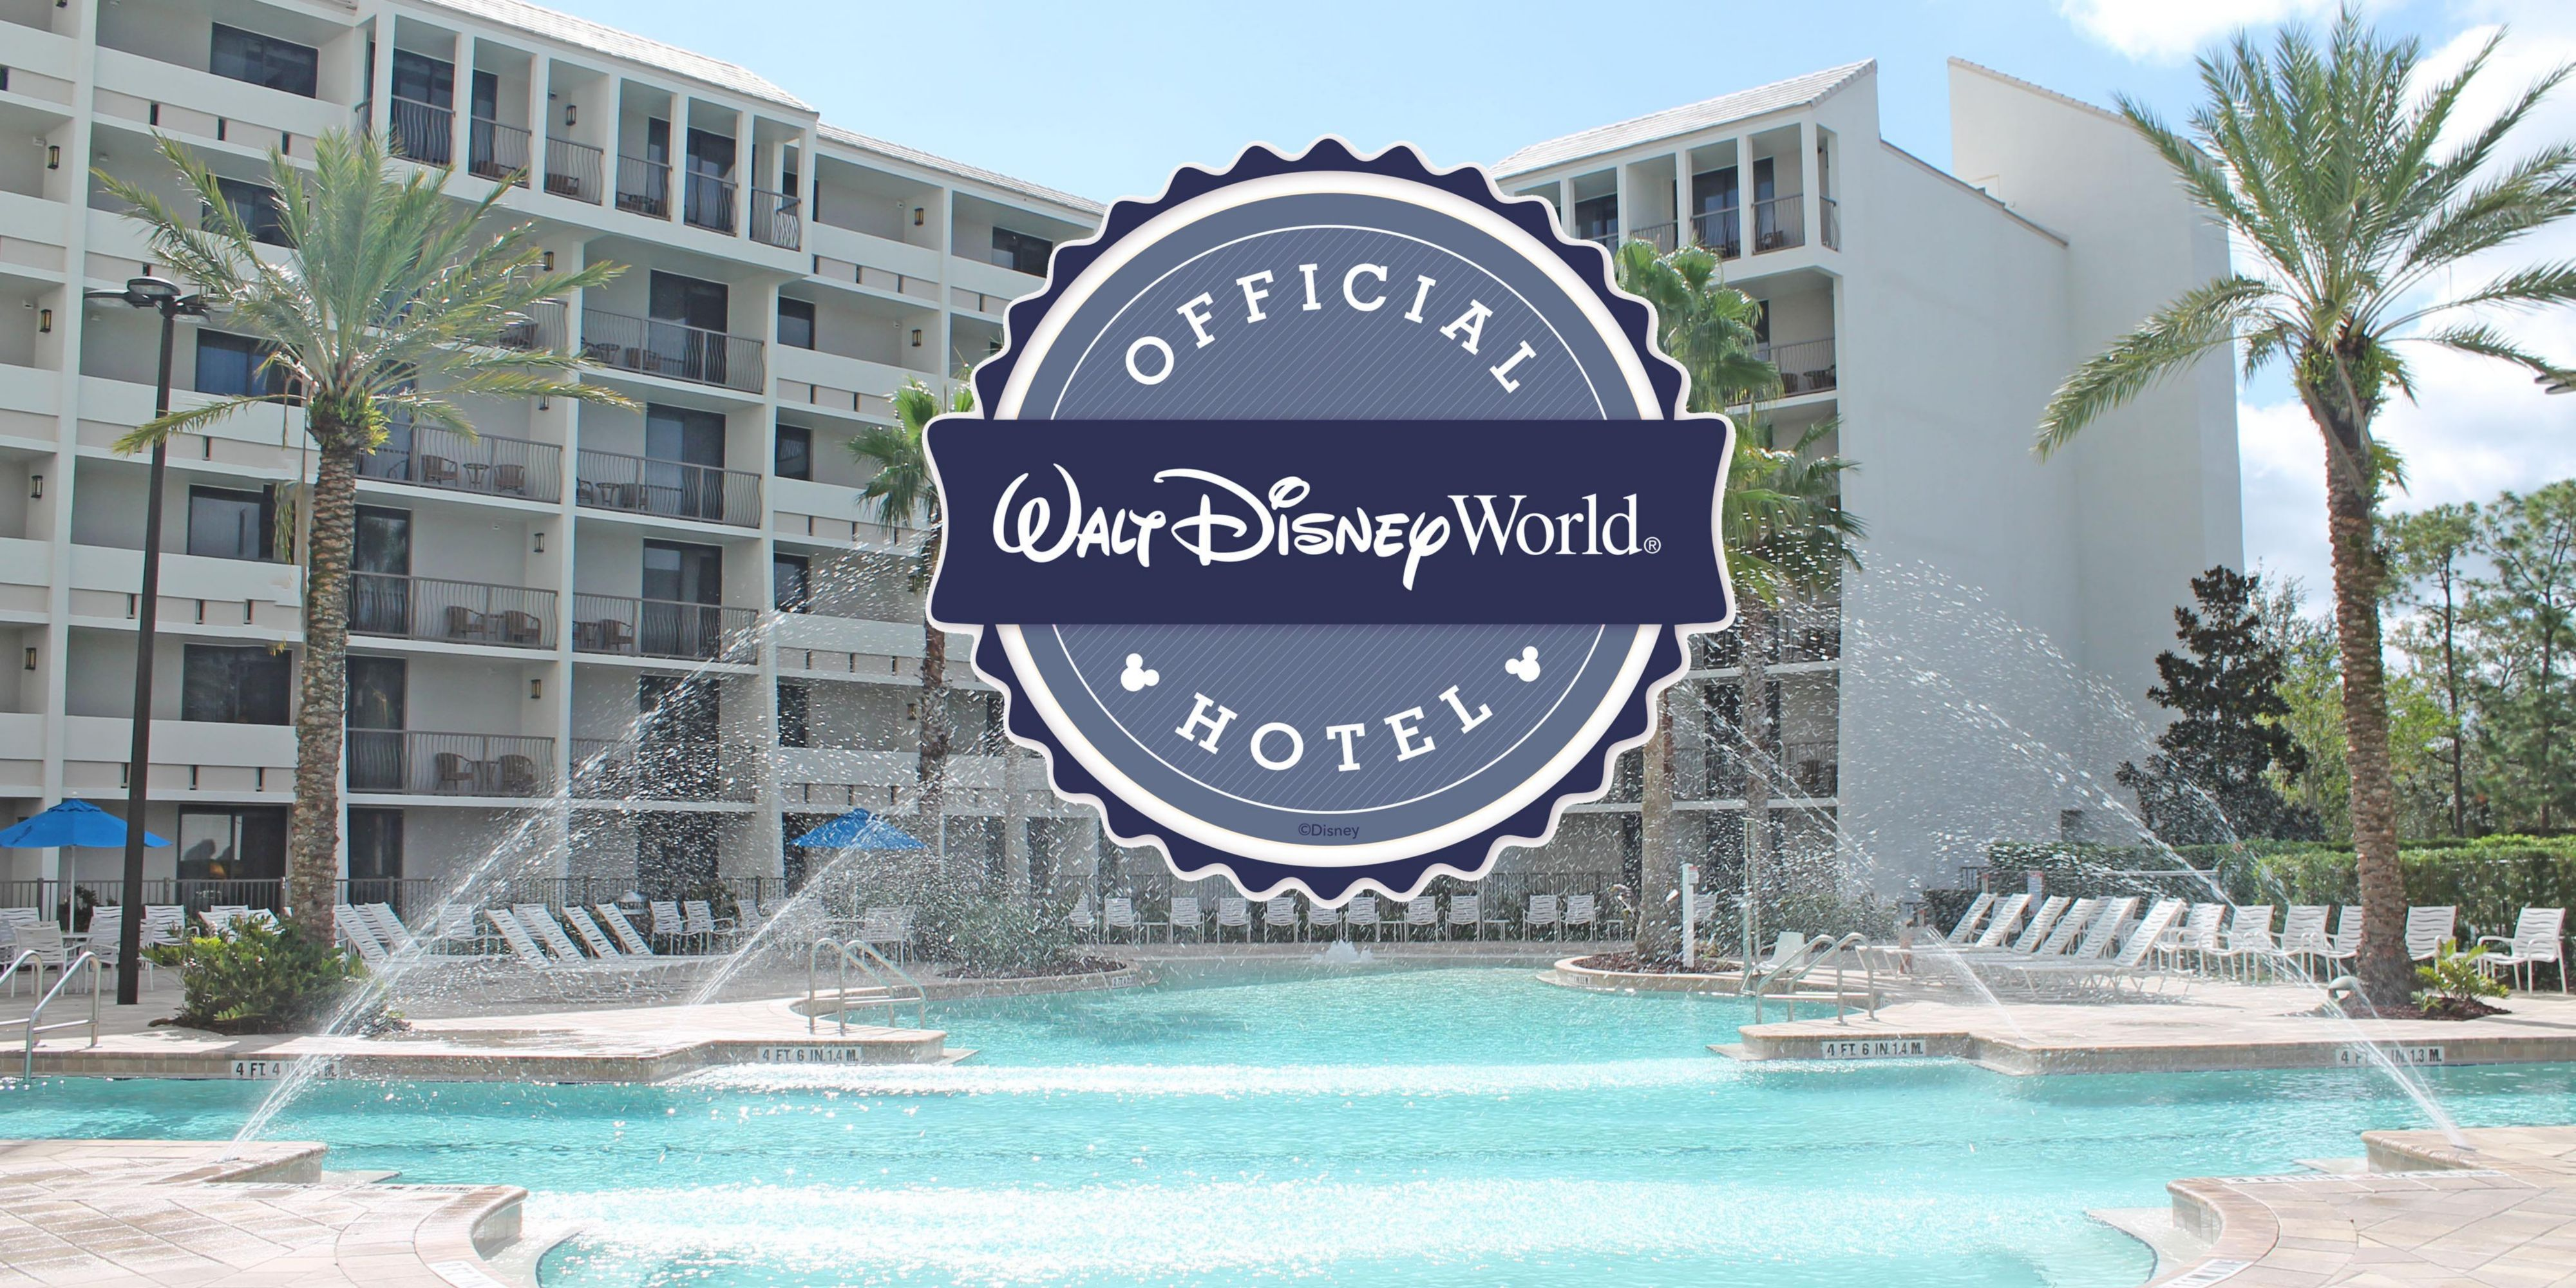 Orlando Hotels: Staybridge Suites Lake Buena Vista - Extended Stay ...